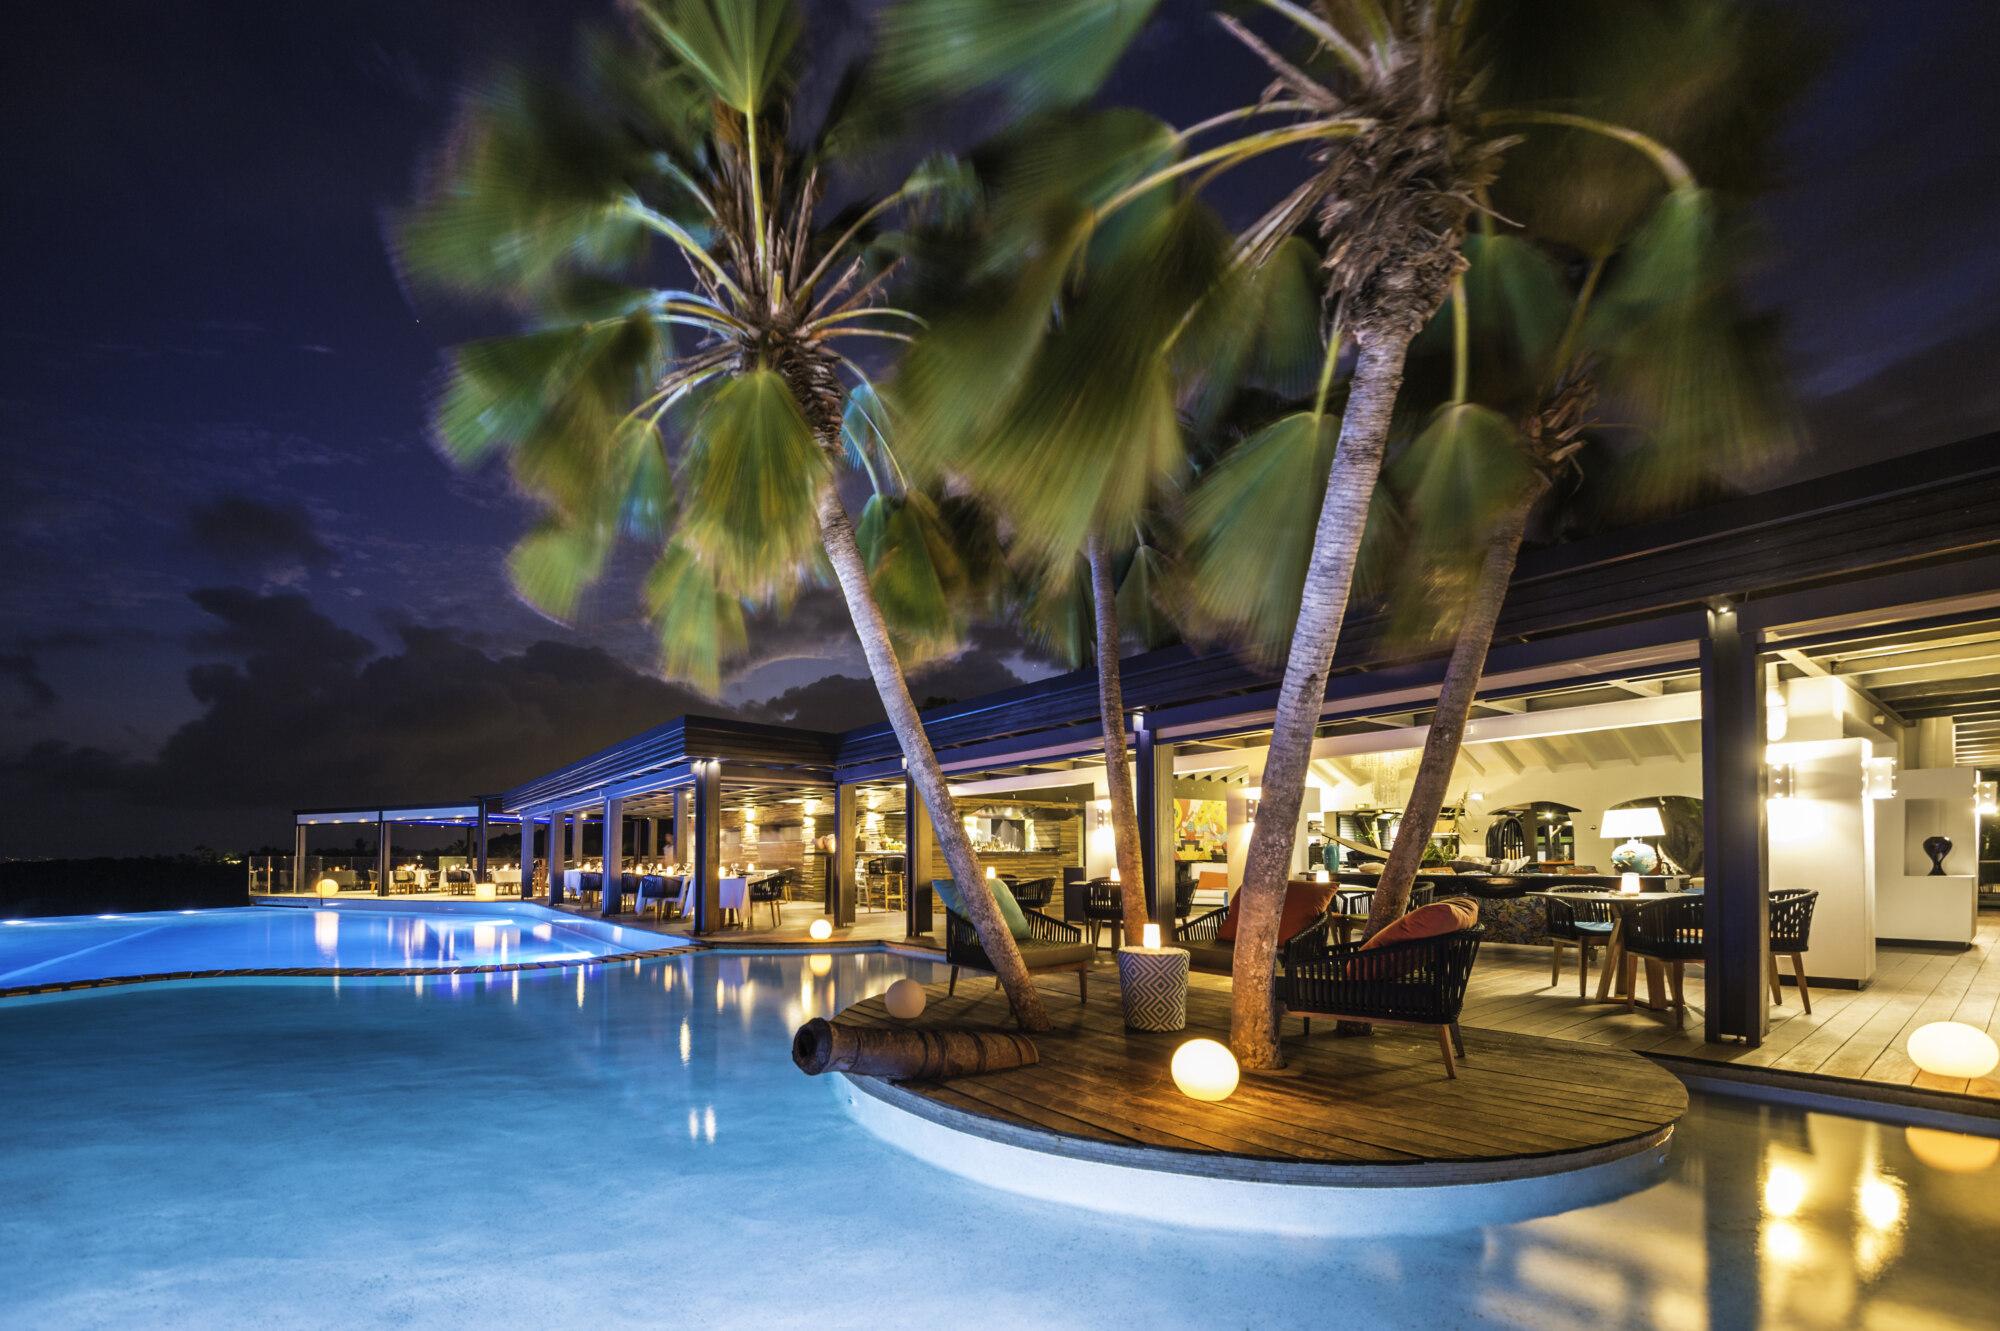 La Toubana Resort & Spa 4*